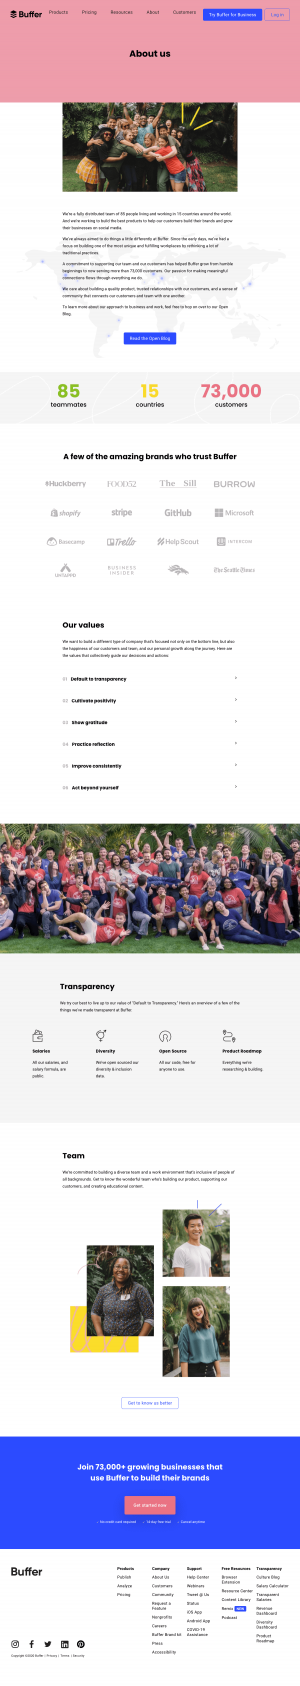 Buffer – About Us page